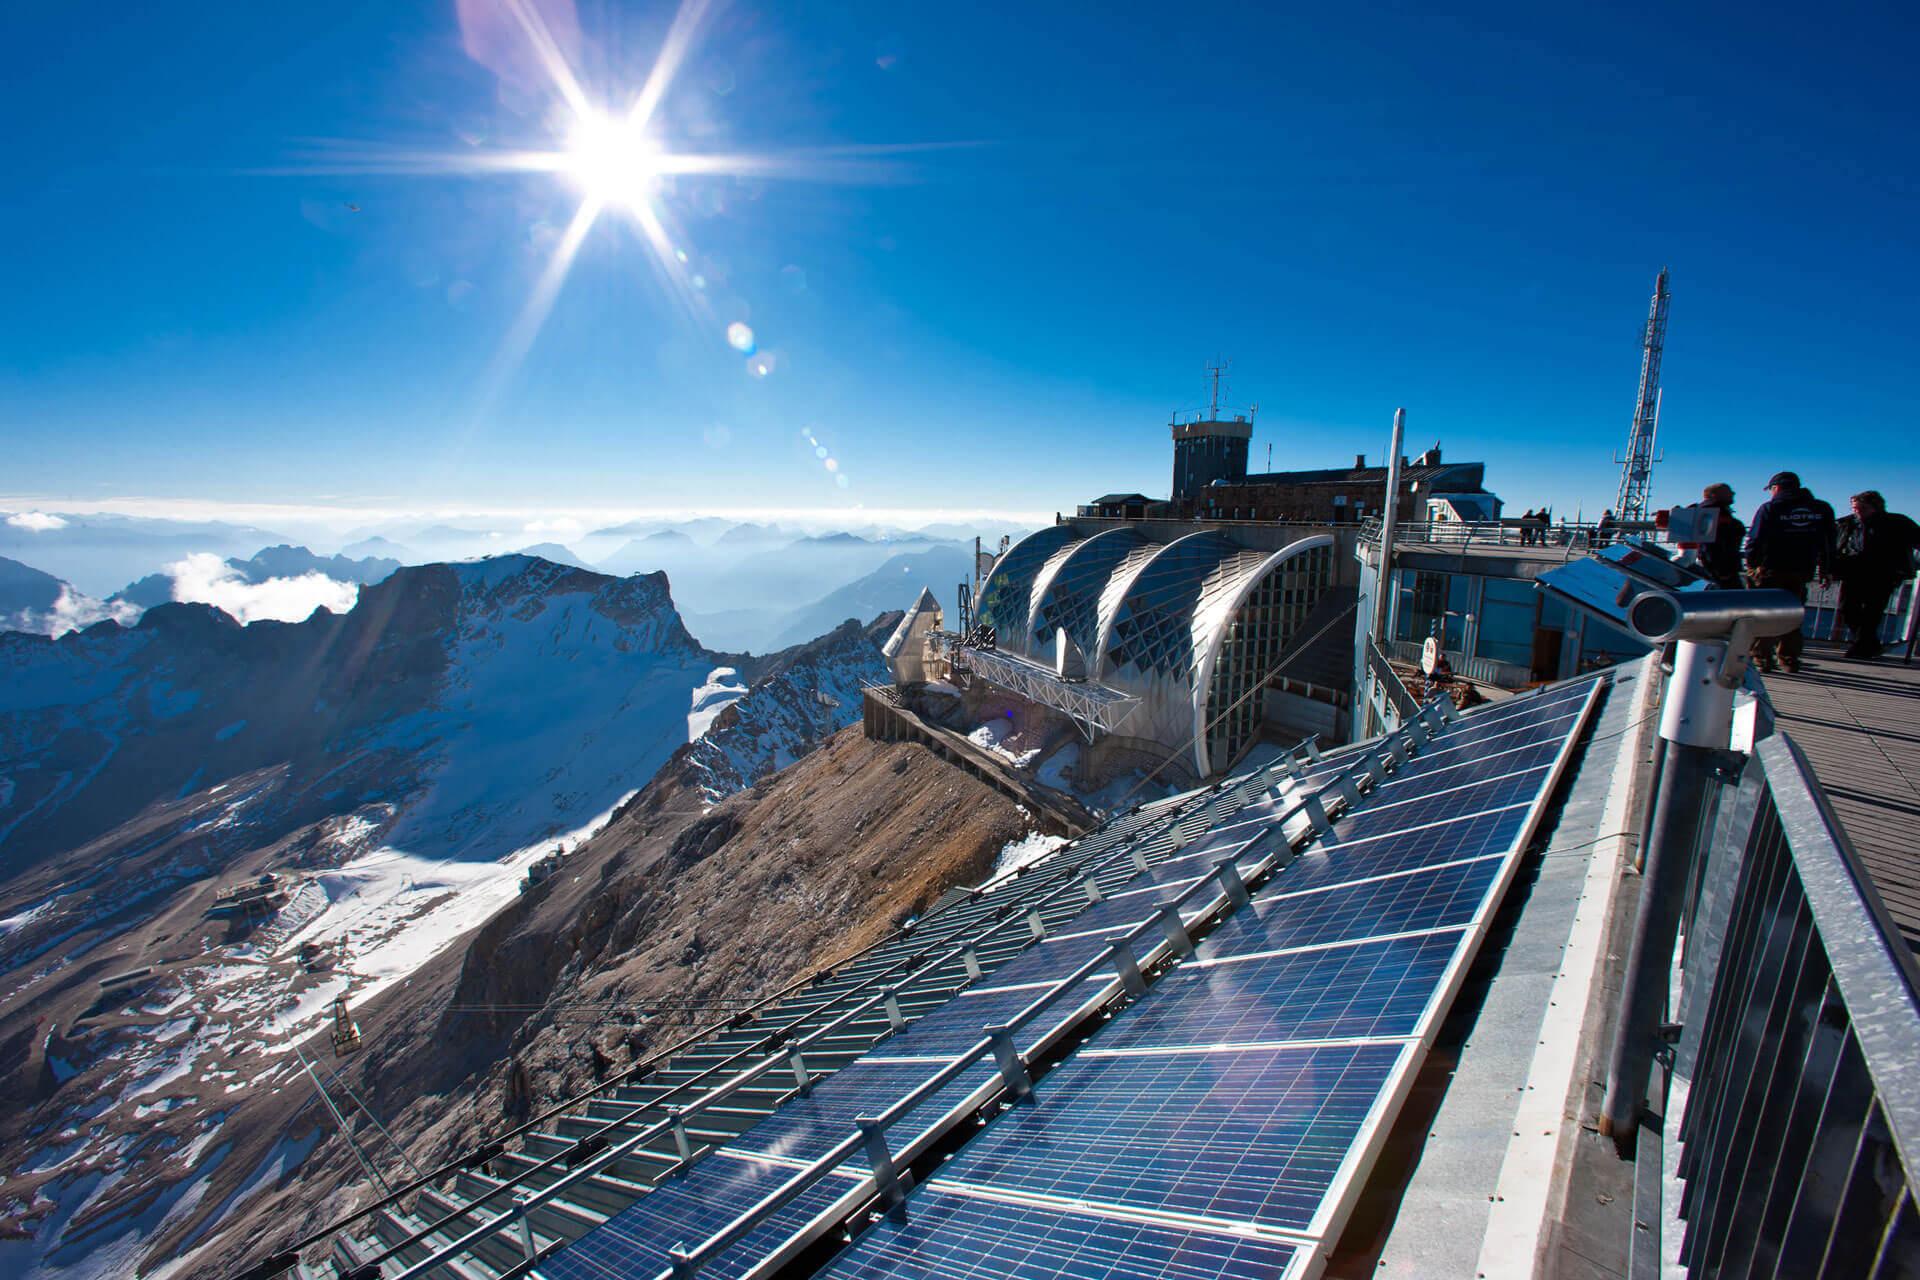 Megújuló energiaforrások, napenergia